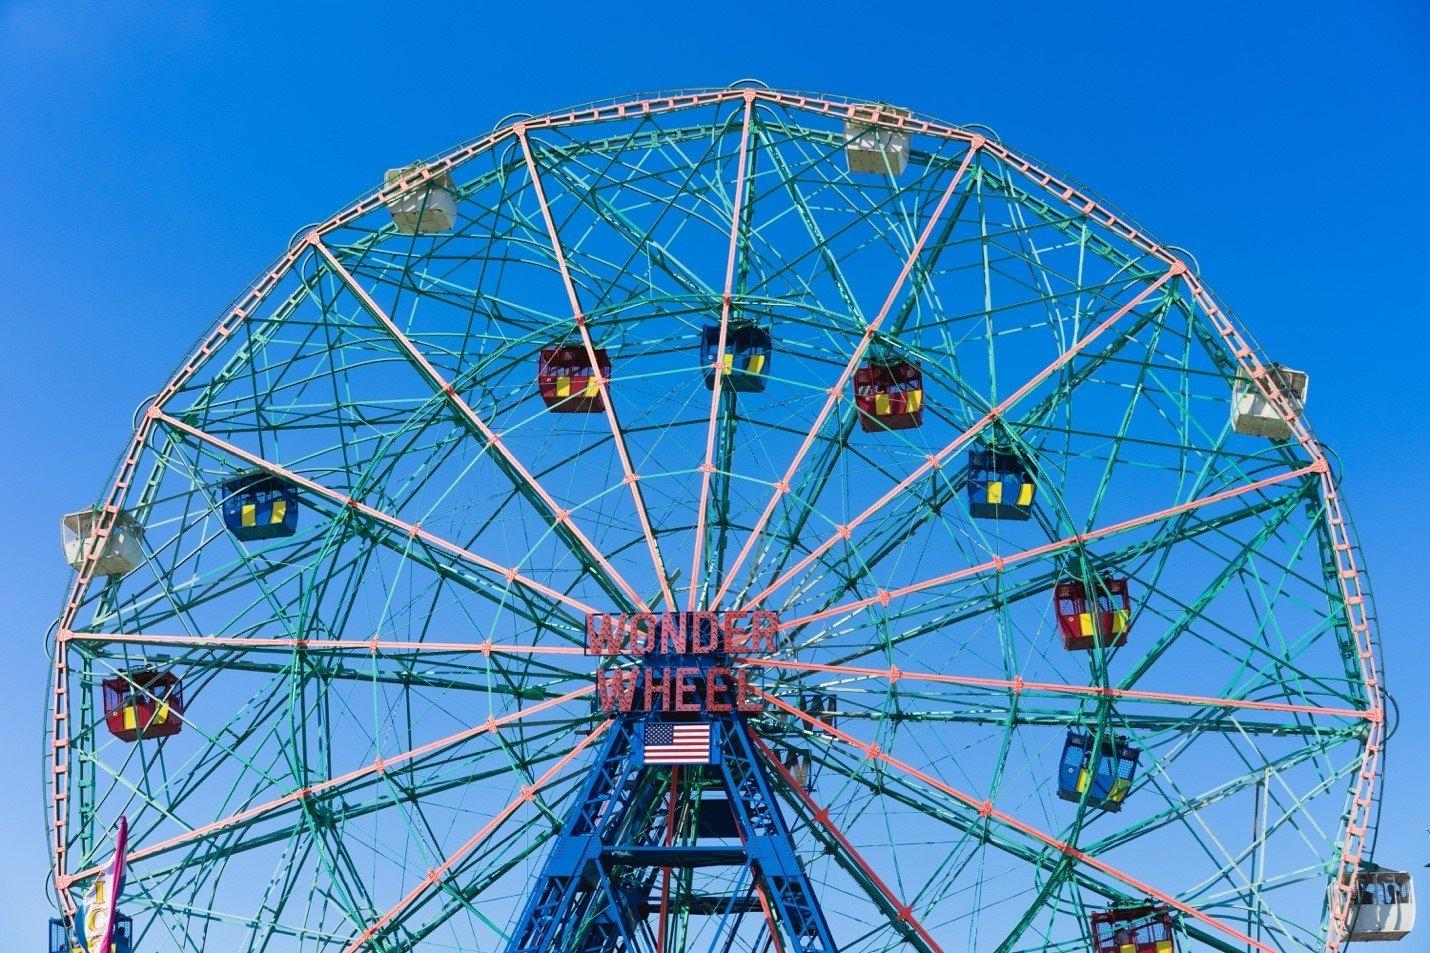 Coney Island New York City NYC United States of America